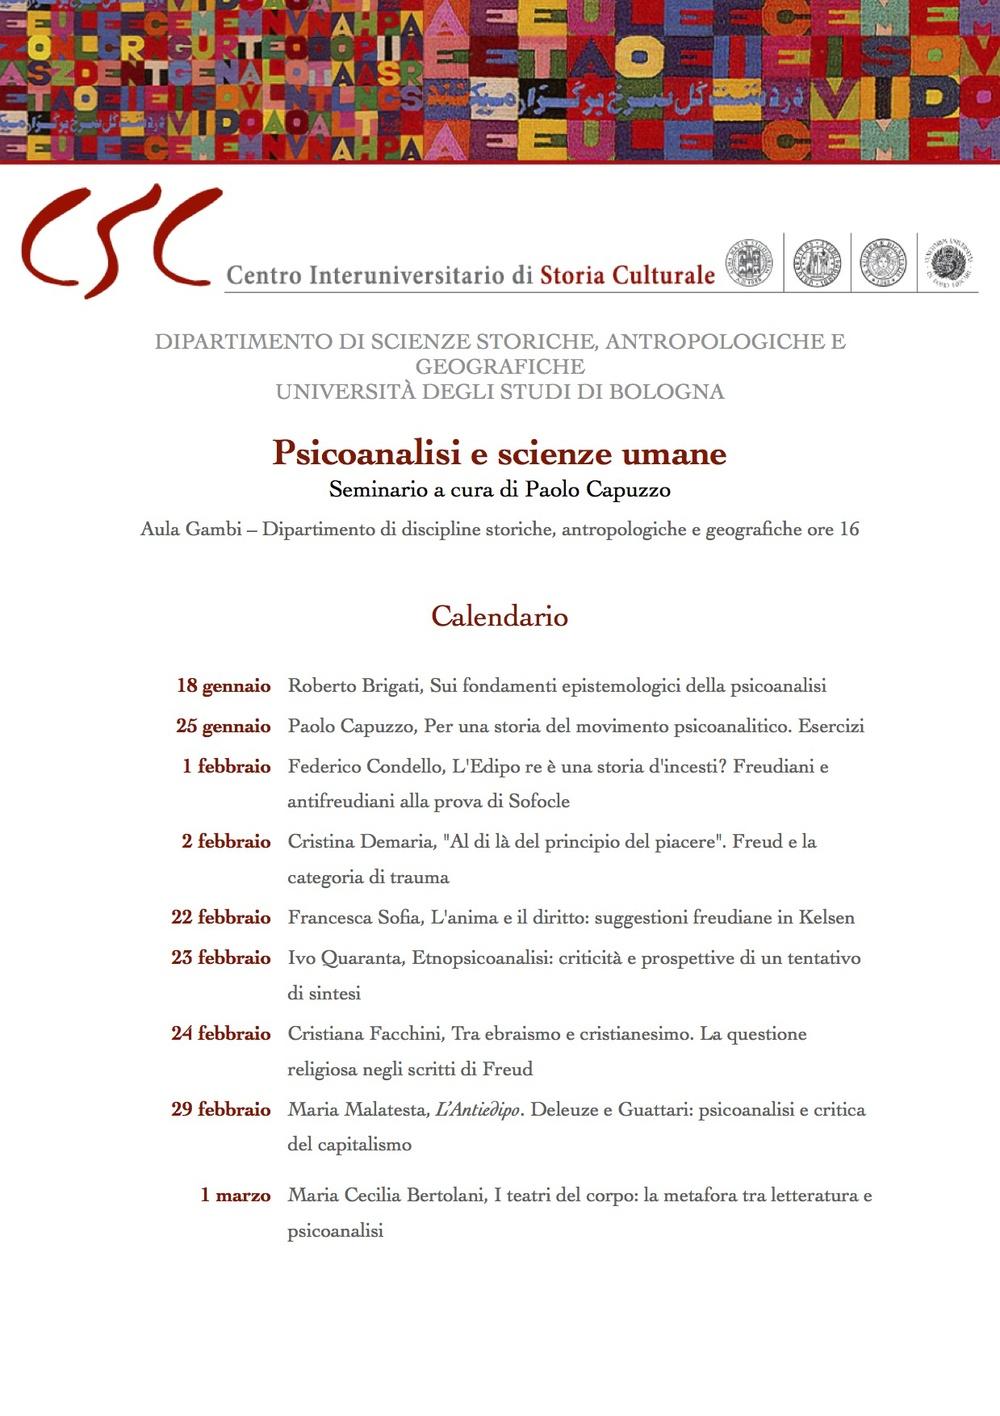 2011 (BO) Psicoanalisi e scienze umane.jpg